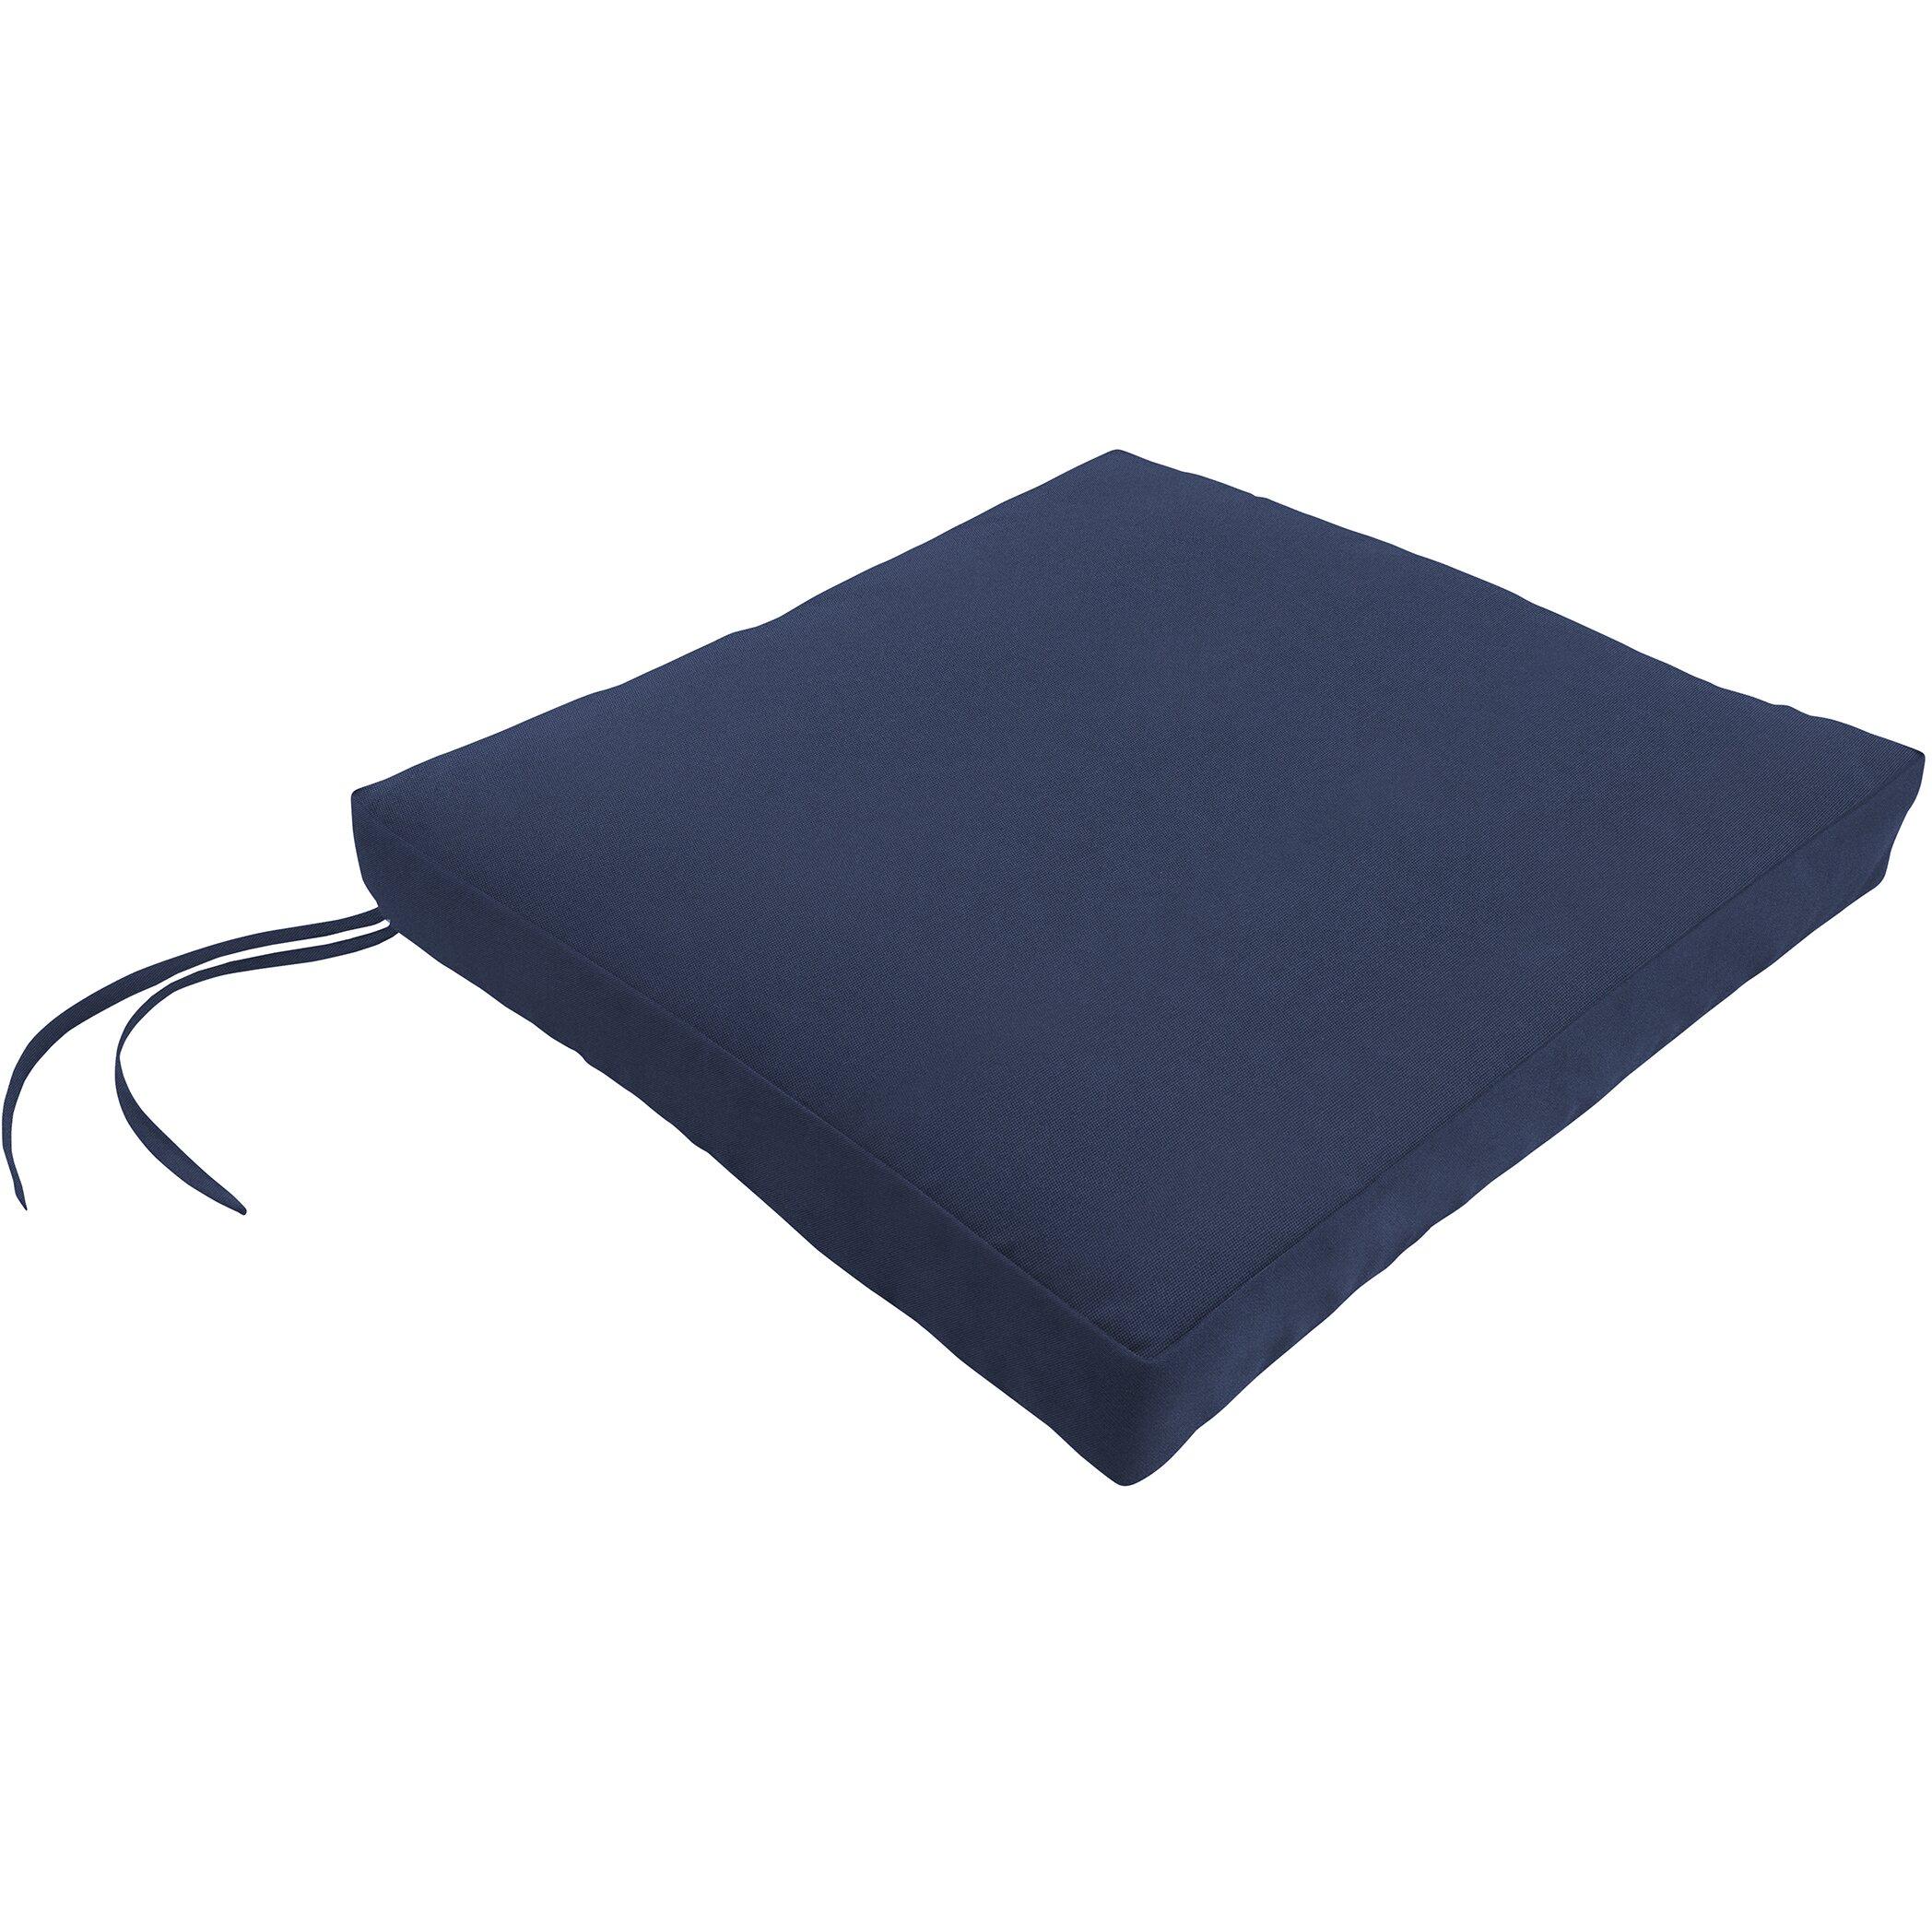 Kiera Outdoor Sunbrella Dining Chair Cushion